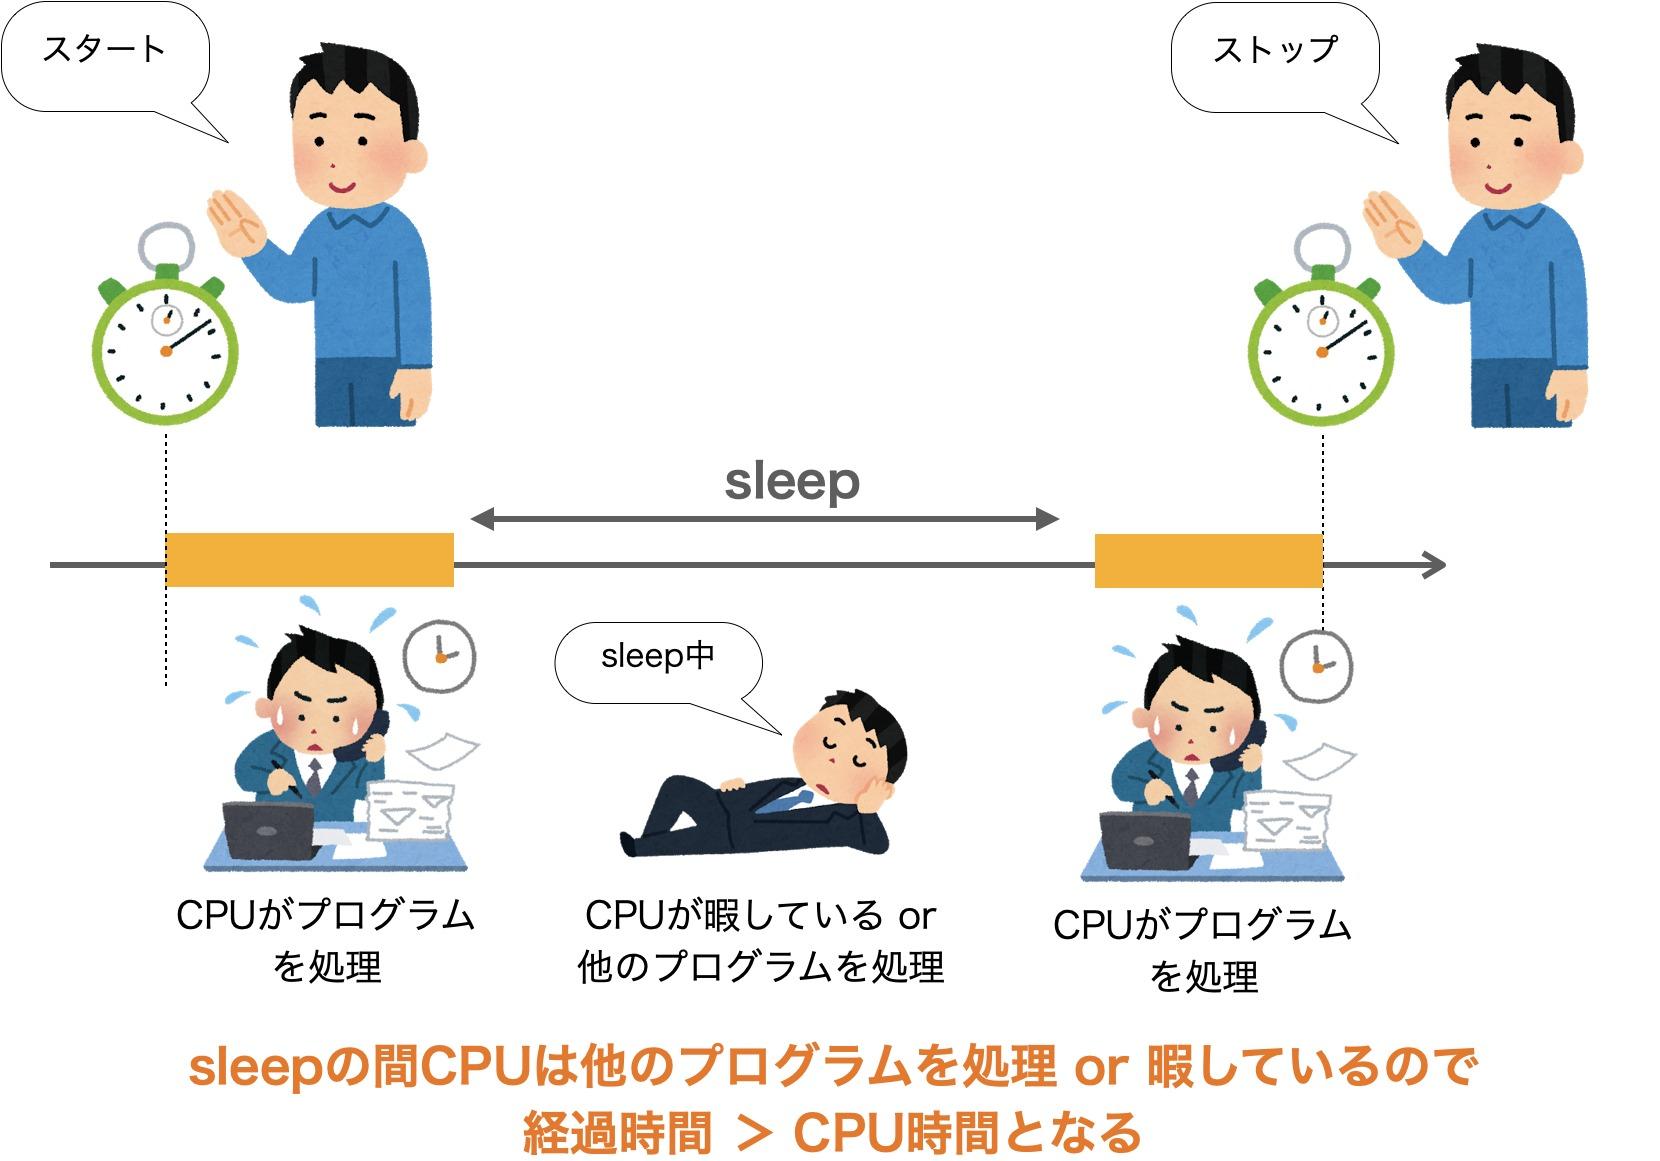 sleepを行った時の処理時間計測